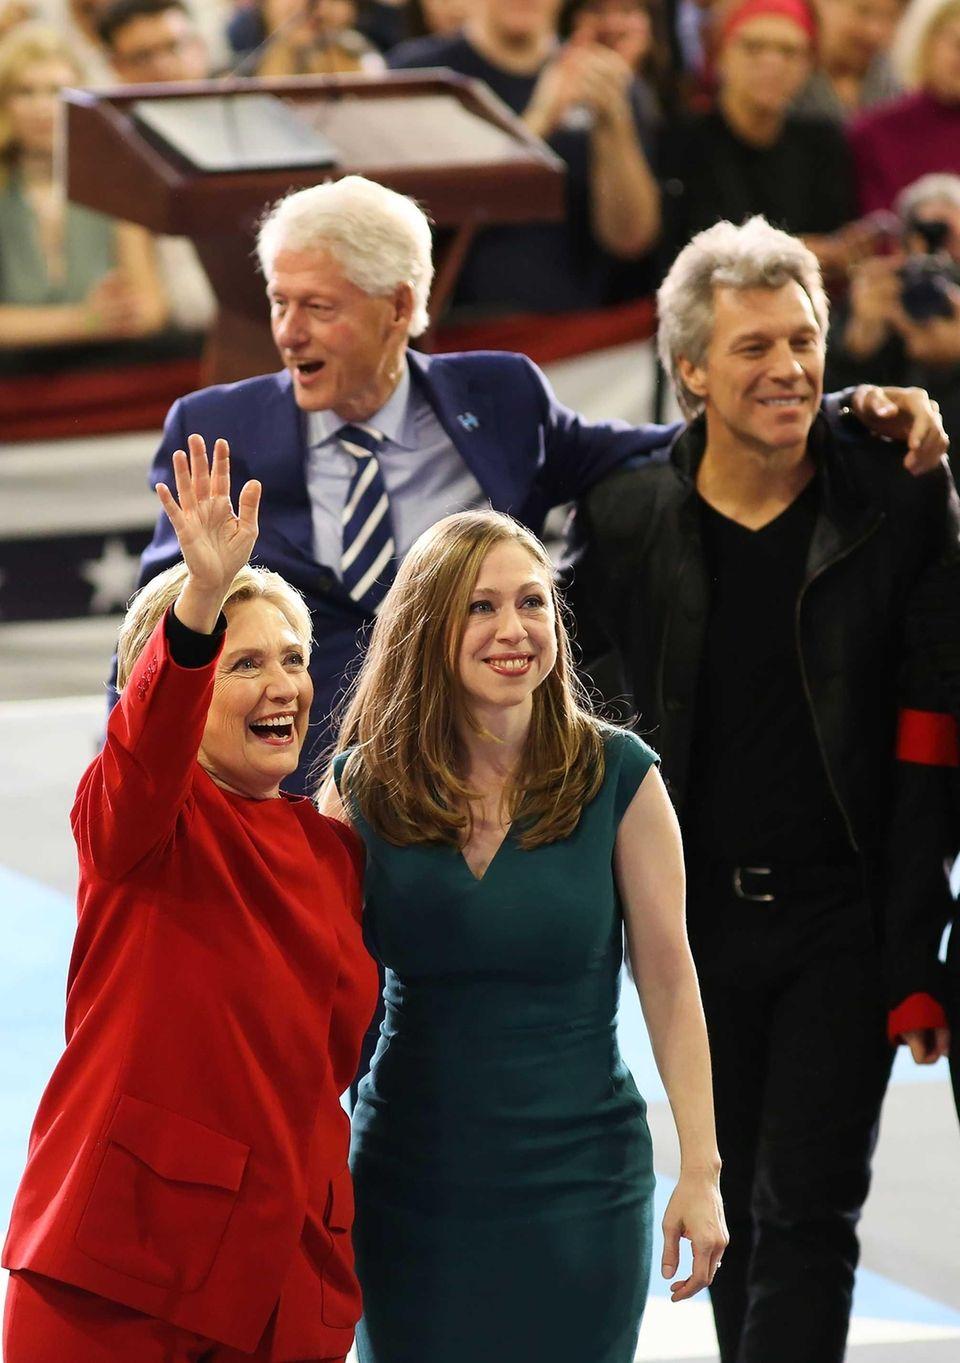 Hillary Clinton, Chelsea Clinton, Bill Clinton, and singer